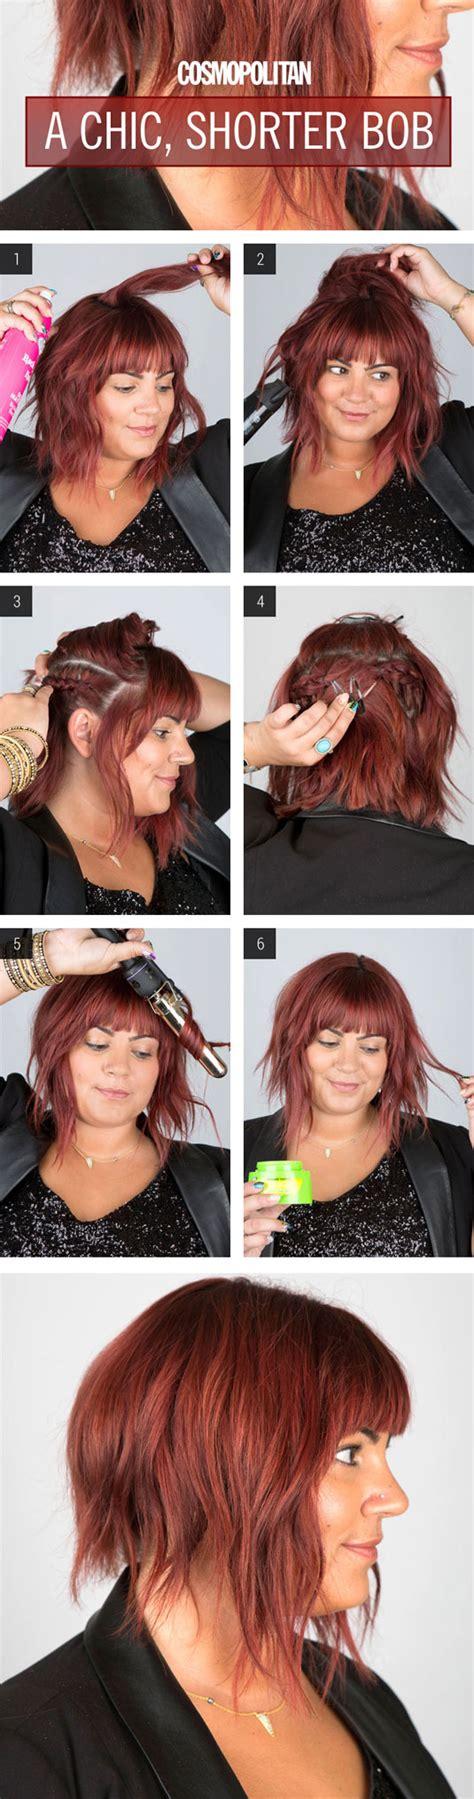 put your on a haircut 19 πανέξυπνες στιλιστικές ιδέες αποκλειστικά για κοντά